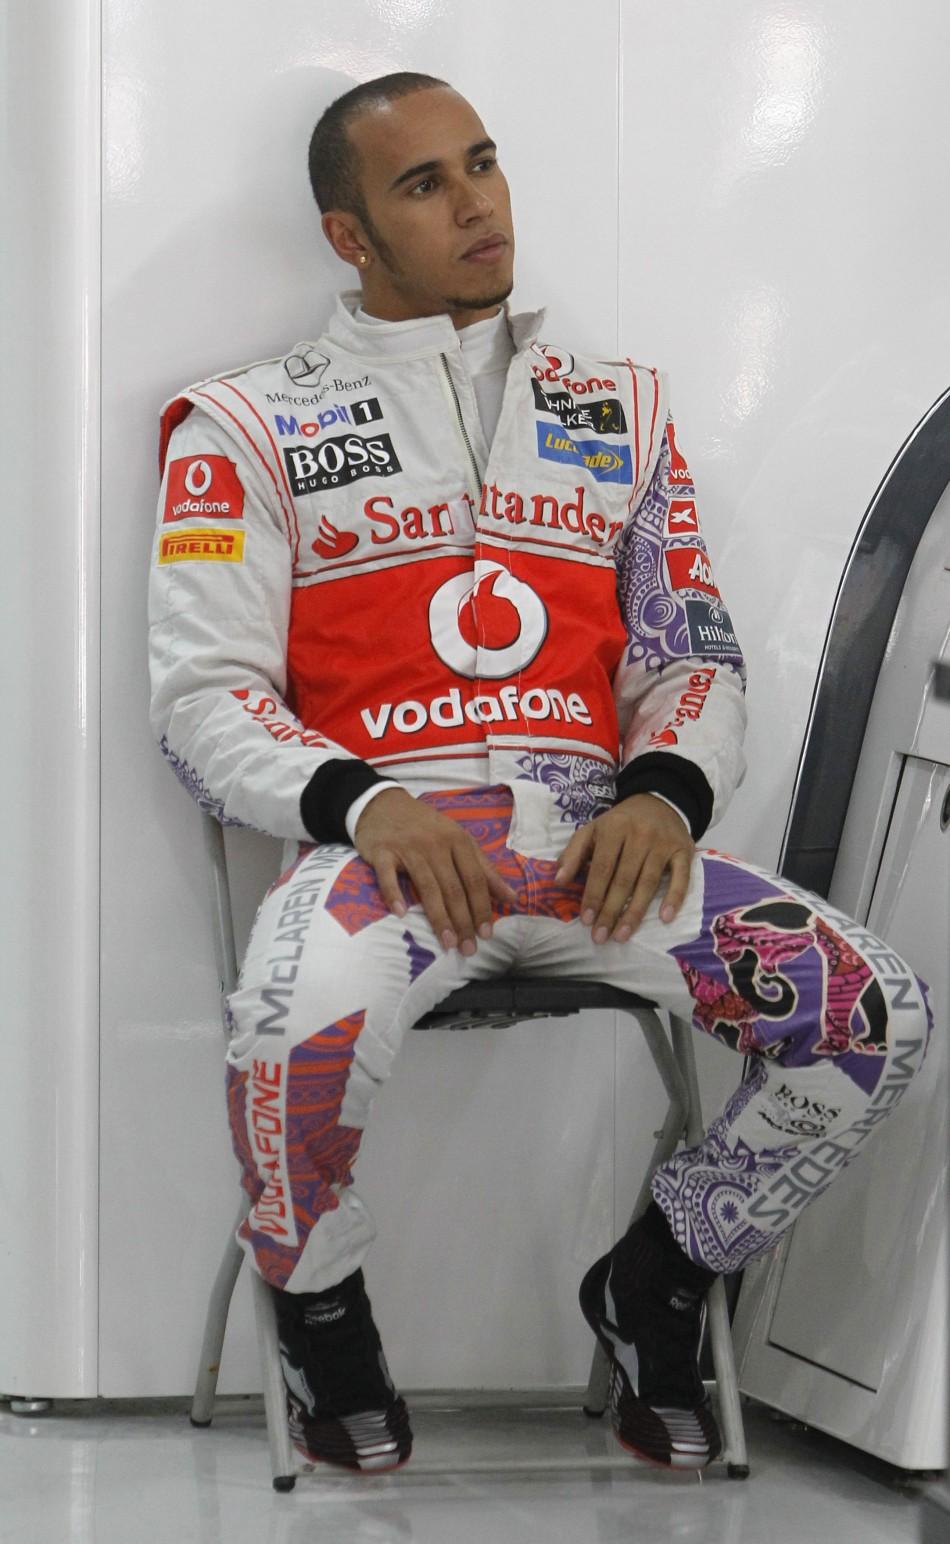 McLaren Formula One driver Lewis Hamilton